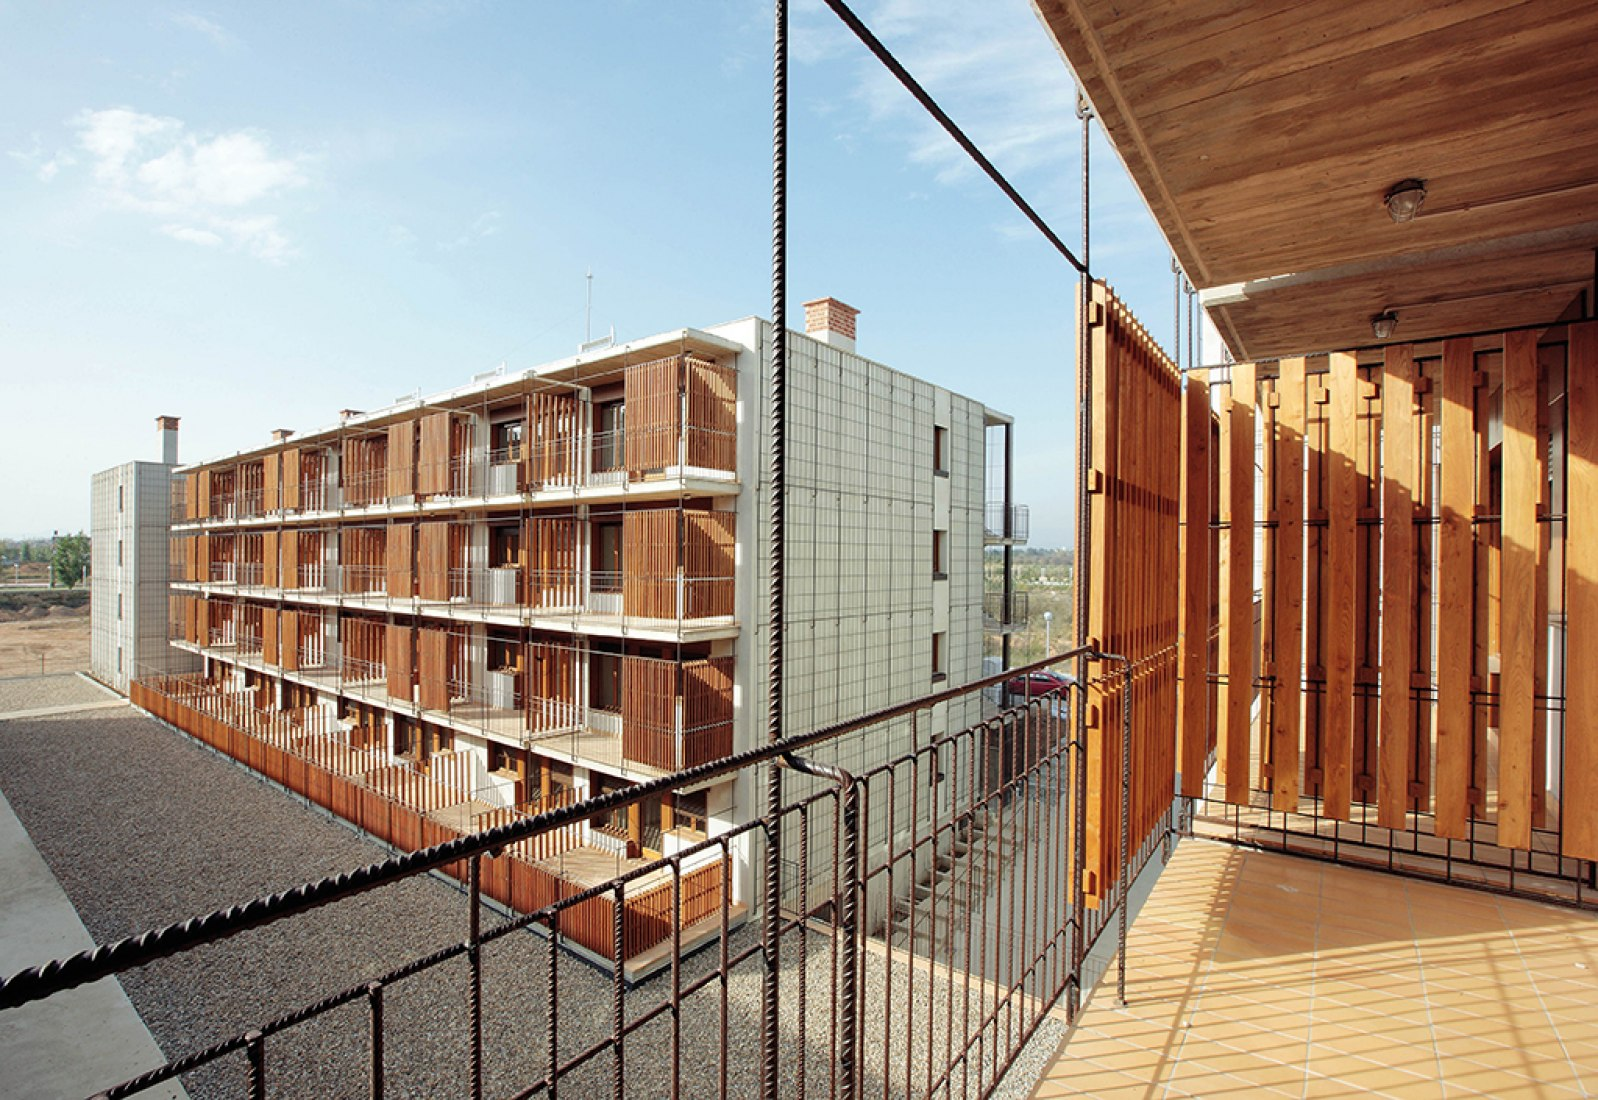 View from the terrace. 80 social housing in Salou by Toni Gironès. Photograph © José Hevia.